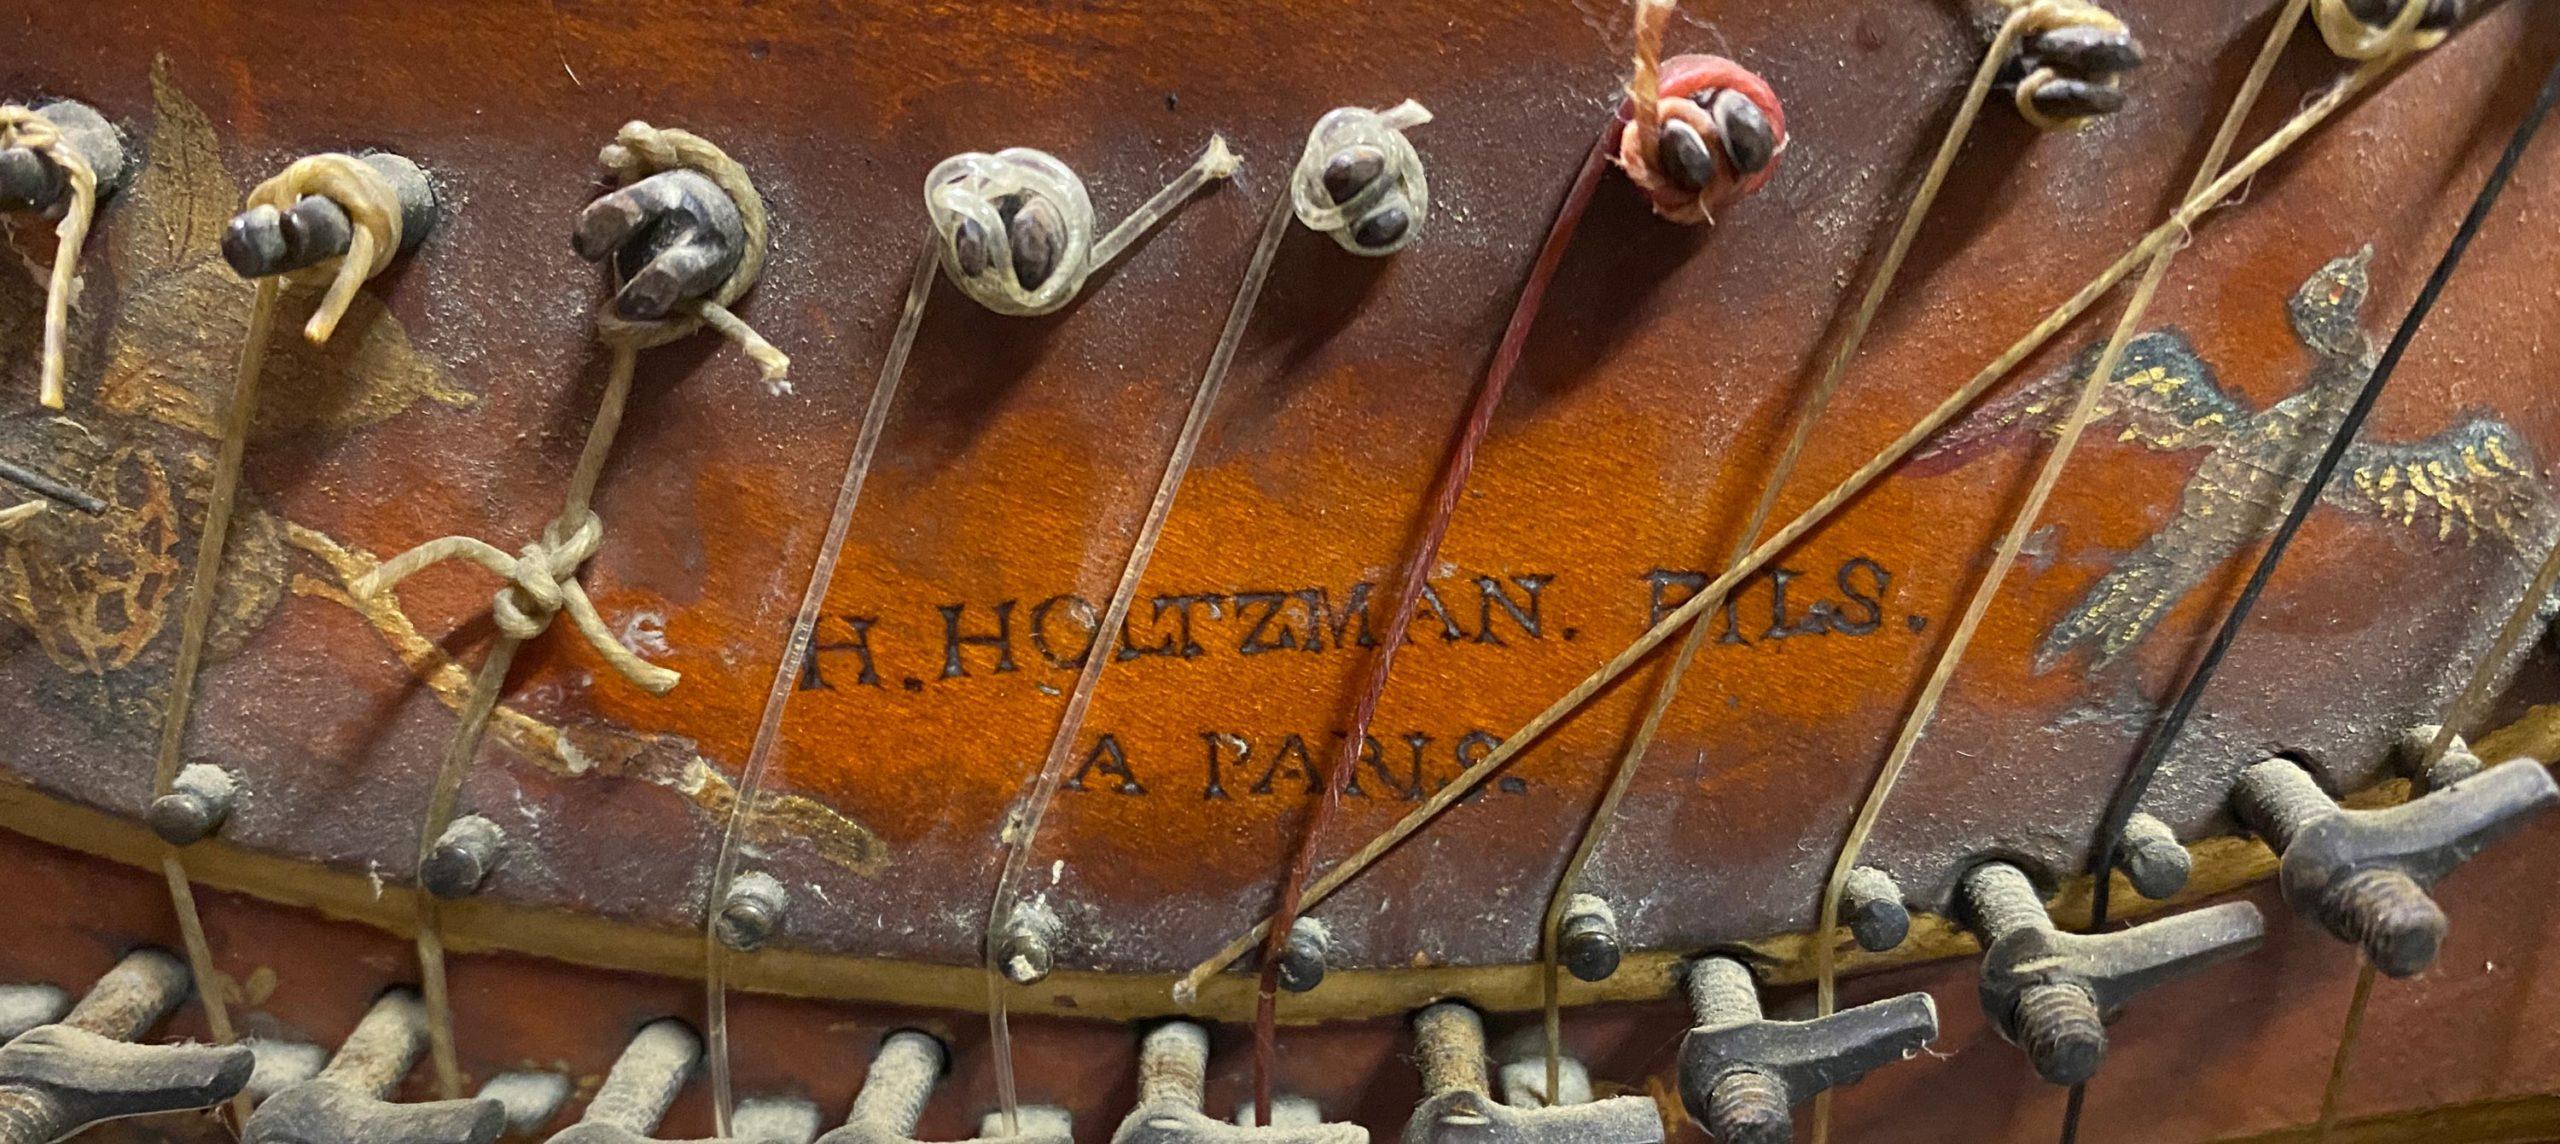 Harpe Holtzman fils, Paris, 1782